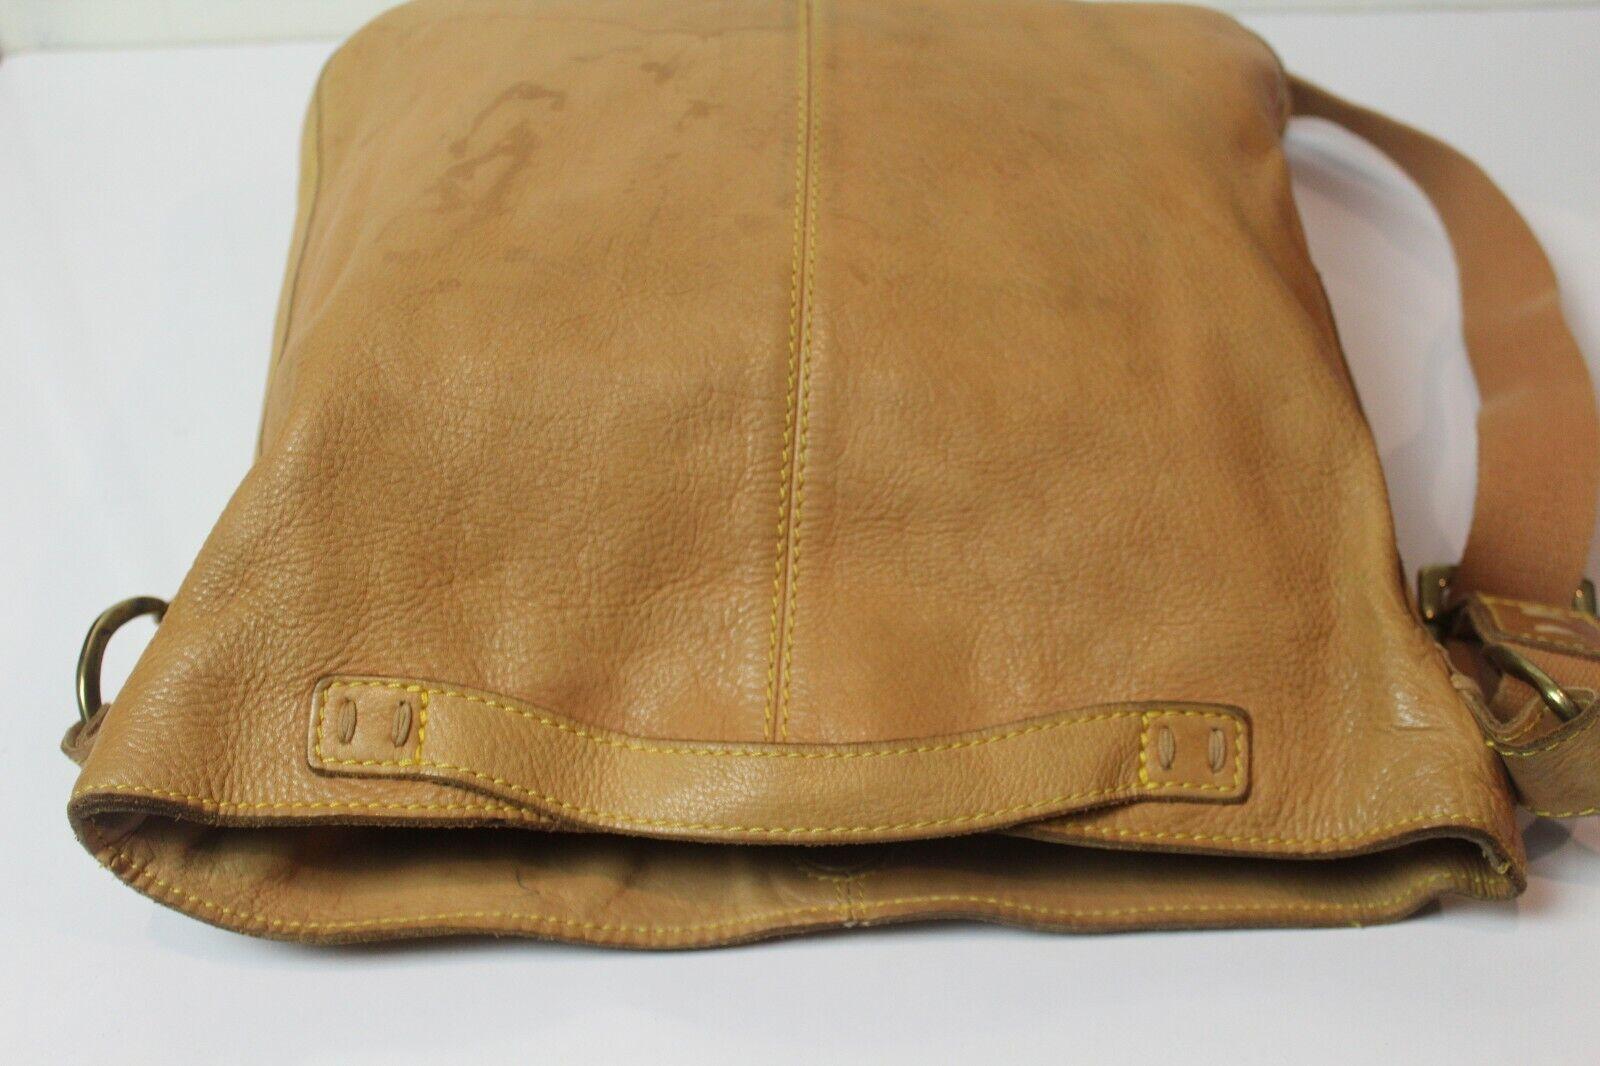 49 Square Miles Tan Leather Bag Hobo Large Bag - image 5